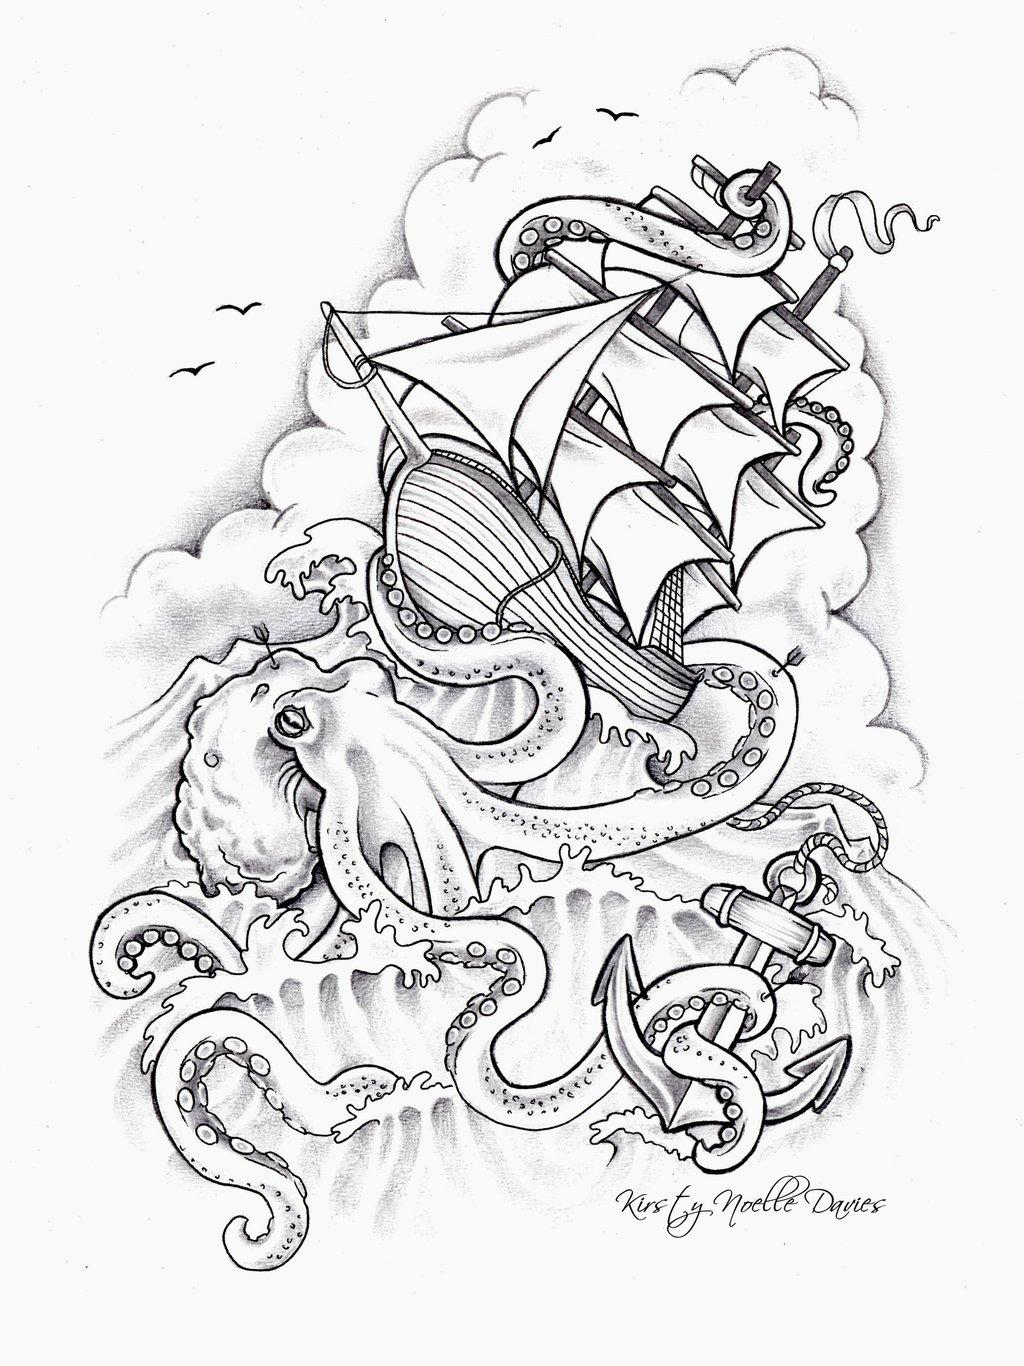 1024x1366 Octopus Sinking Ship Tattoo Design By Kirstynoelledavies